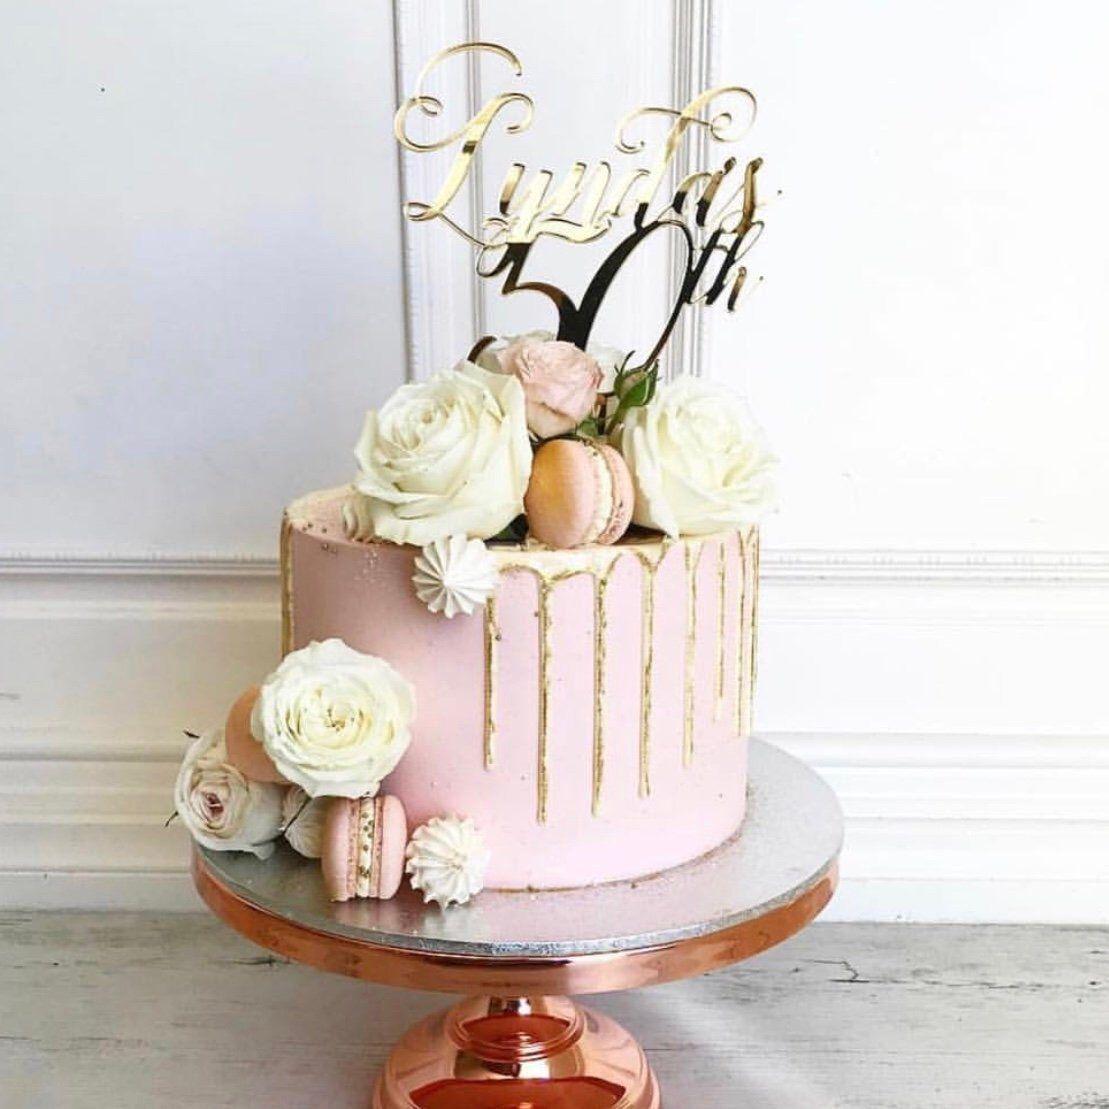 50th Birthday Party Fifty Birthday Cake Topper Any Age ! 50th birthday Cake Topper Custom Cake Topper Birthday Cake Topper